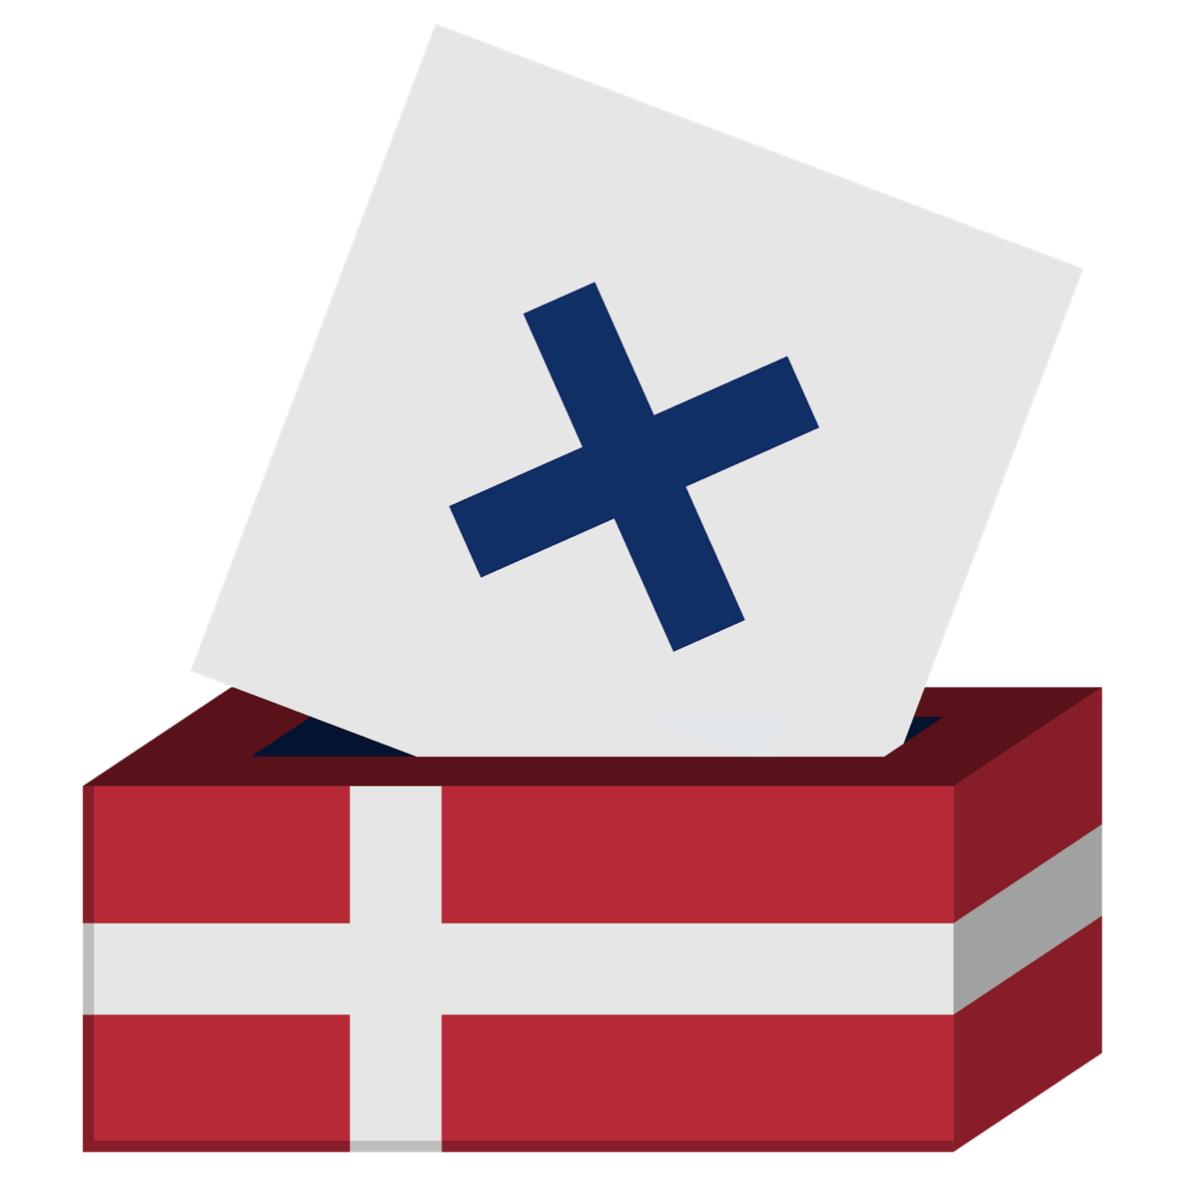 twitter, emoji, valg, folketingsvalg